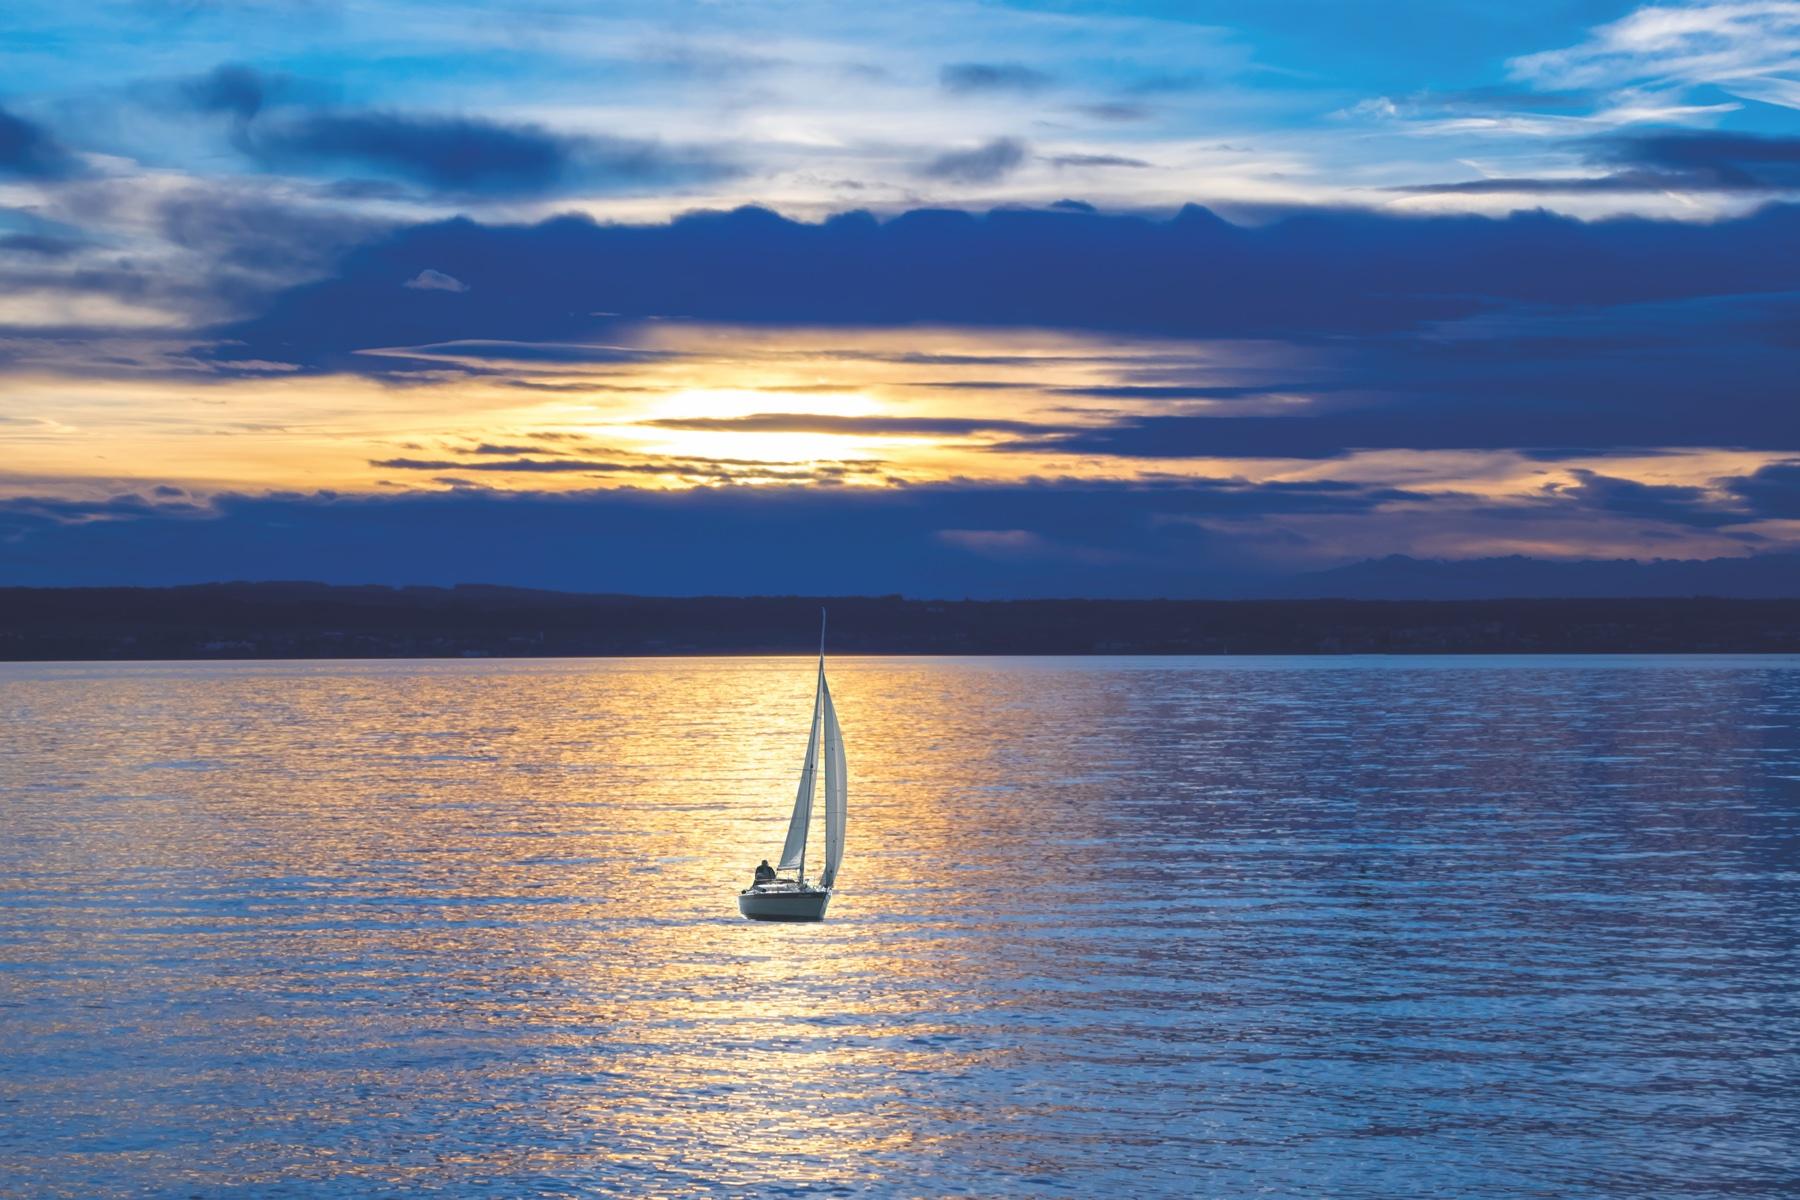 FF201911-sailing-boat-596462